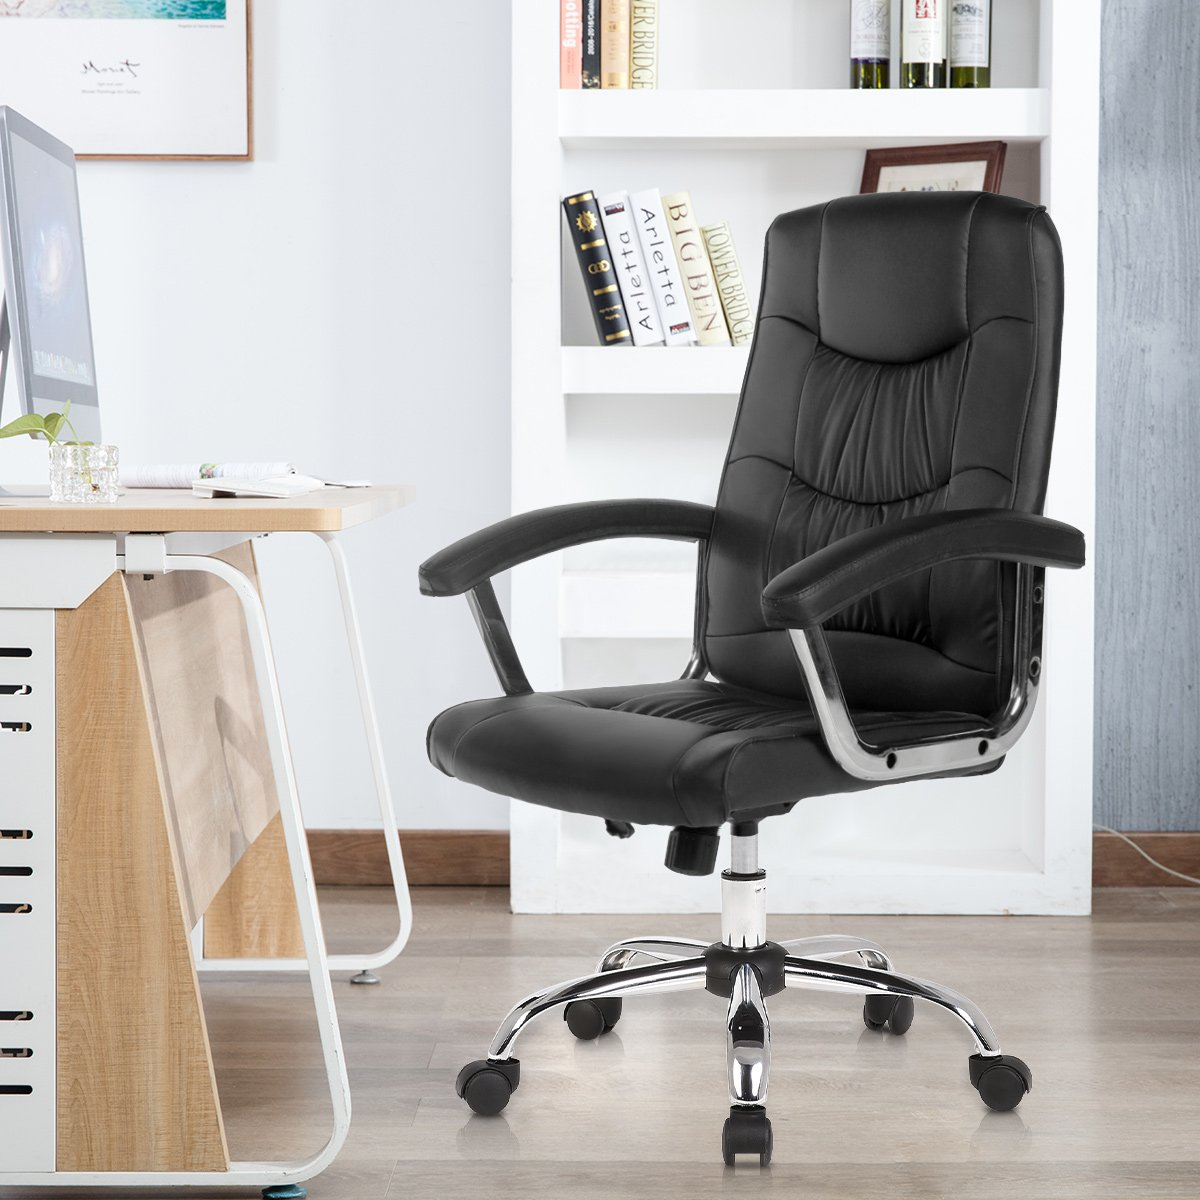 B2C2B Ergonomic PU Leather Swivel Executive Chair Home Office Computer Task Chair Adjustable Desk Chair Black 1658